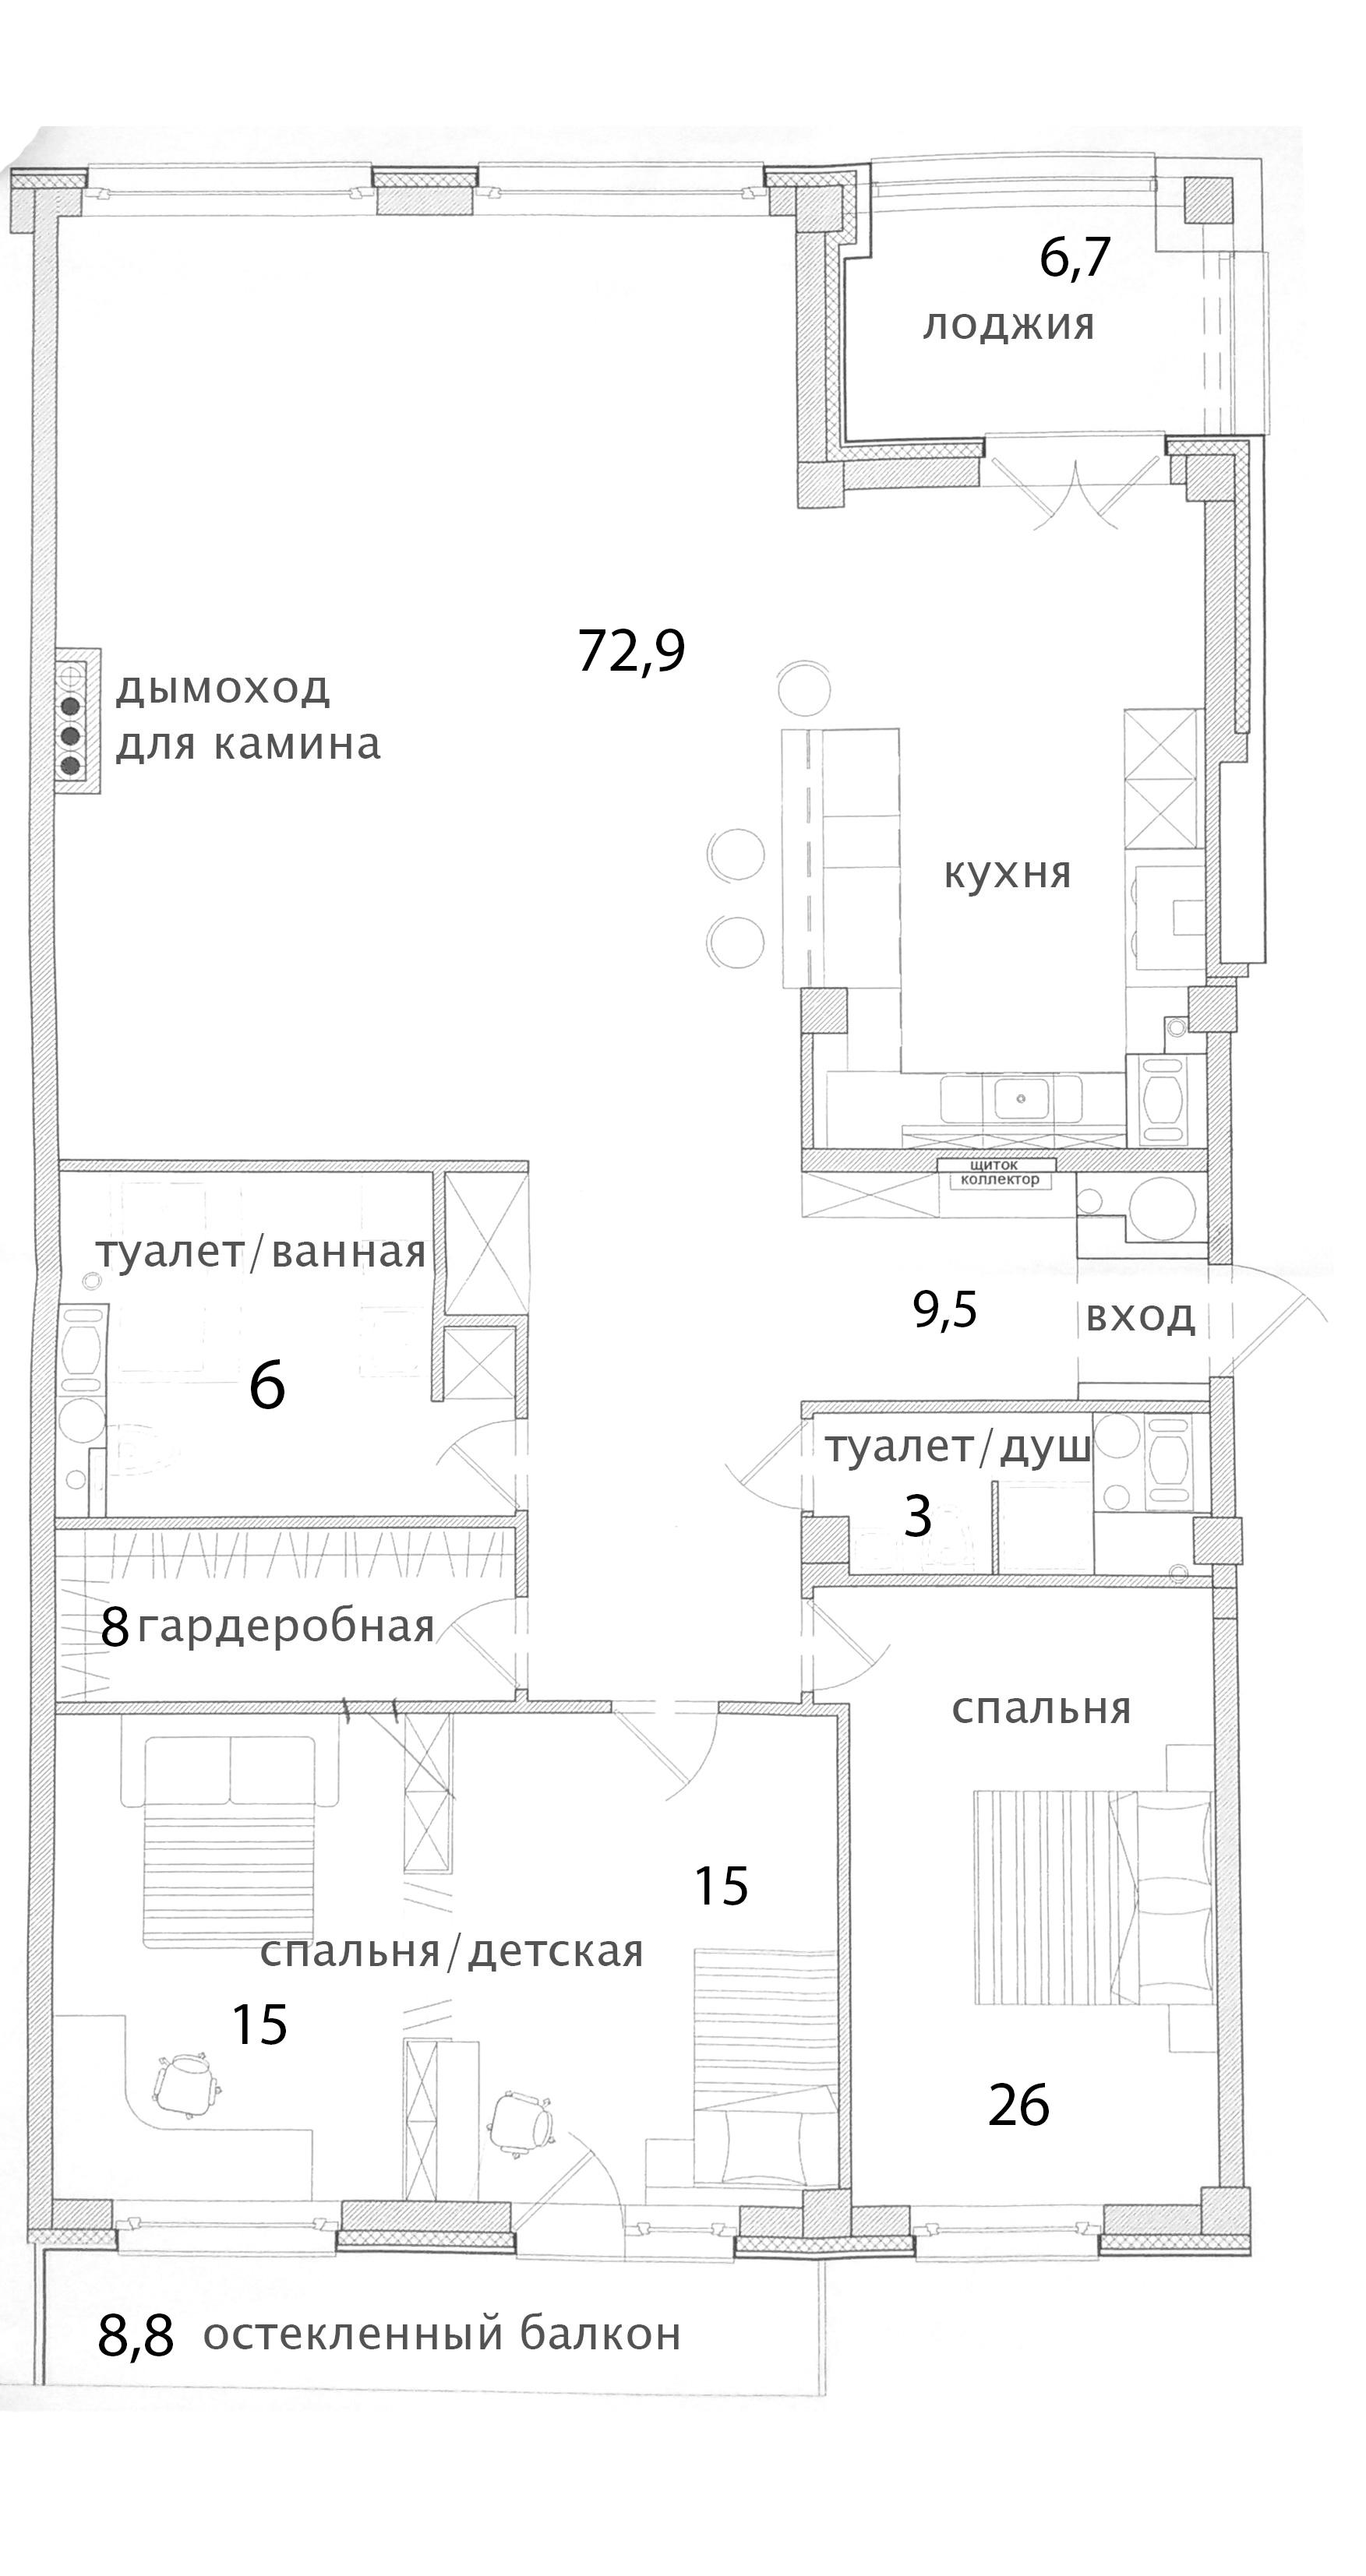 4Е-комнатная квартира, 155.4 м², 6 этаж – Планировка